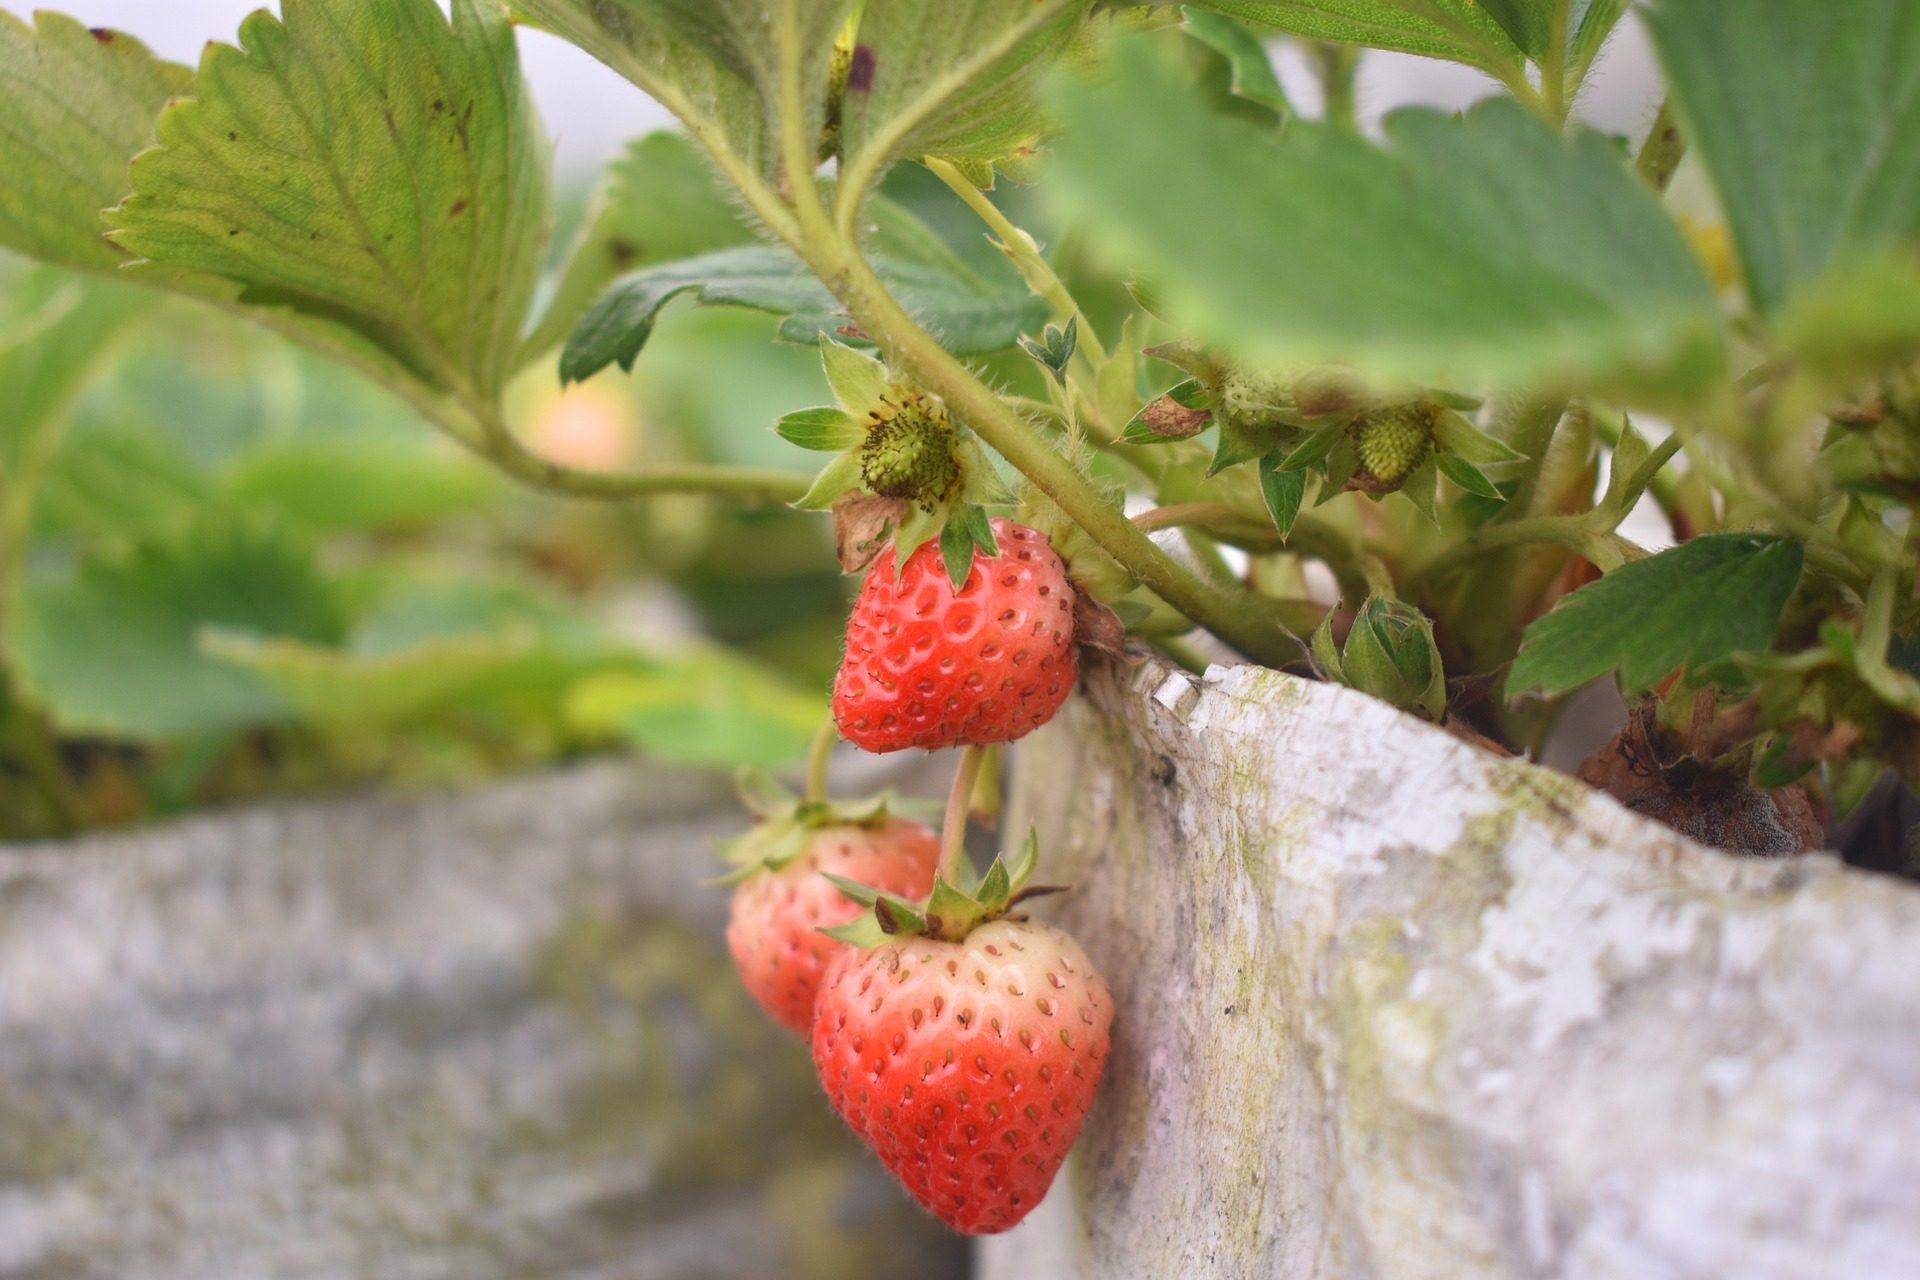 स्ट्रॉबेरी, भू-तल, फल, बर्तन, गार्डन - HD वॉलपेपर - प्रोफेसर-falken.com